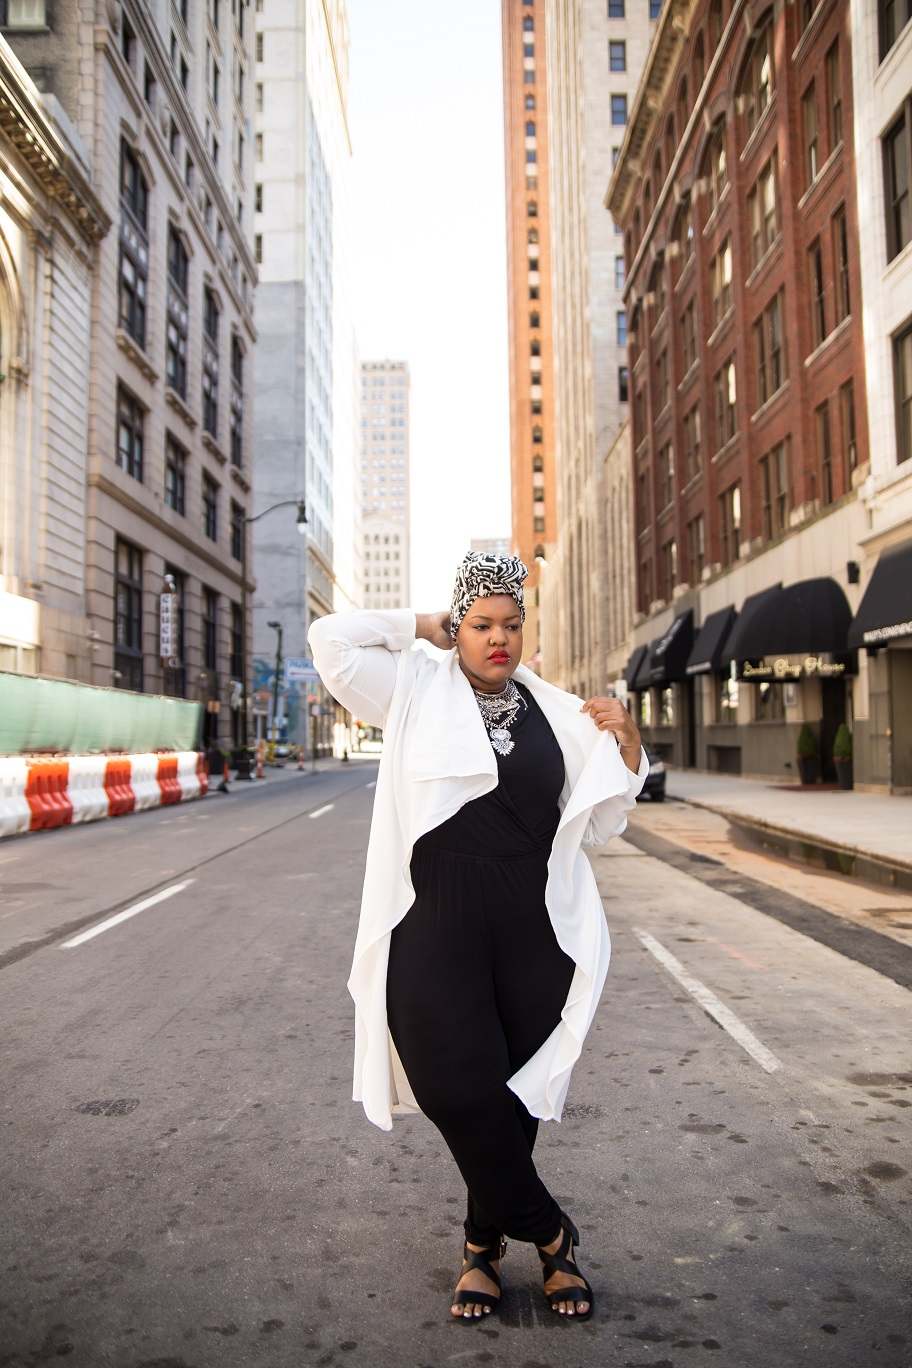 Plus-Size-Detroit-Style-Blogger-Street-Style-Body-Positive-Muslim-Girl